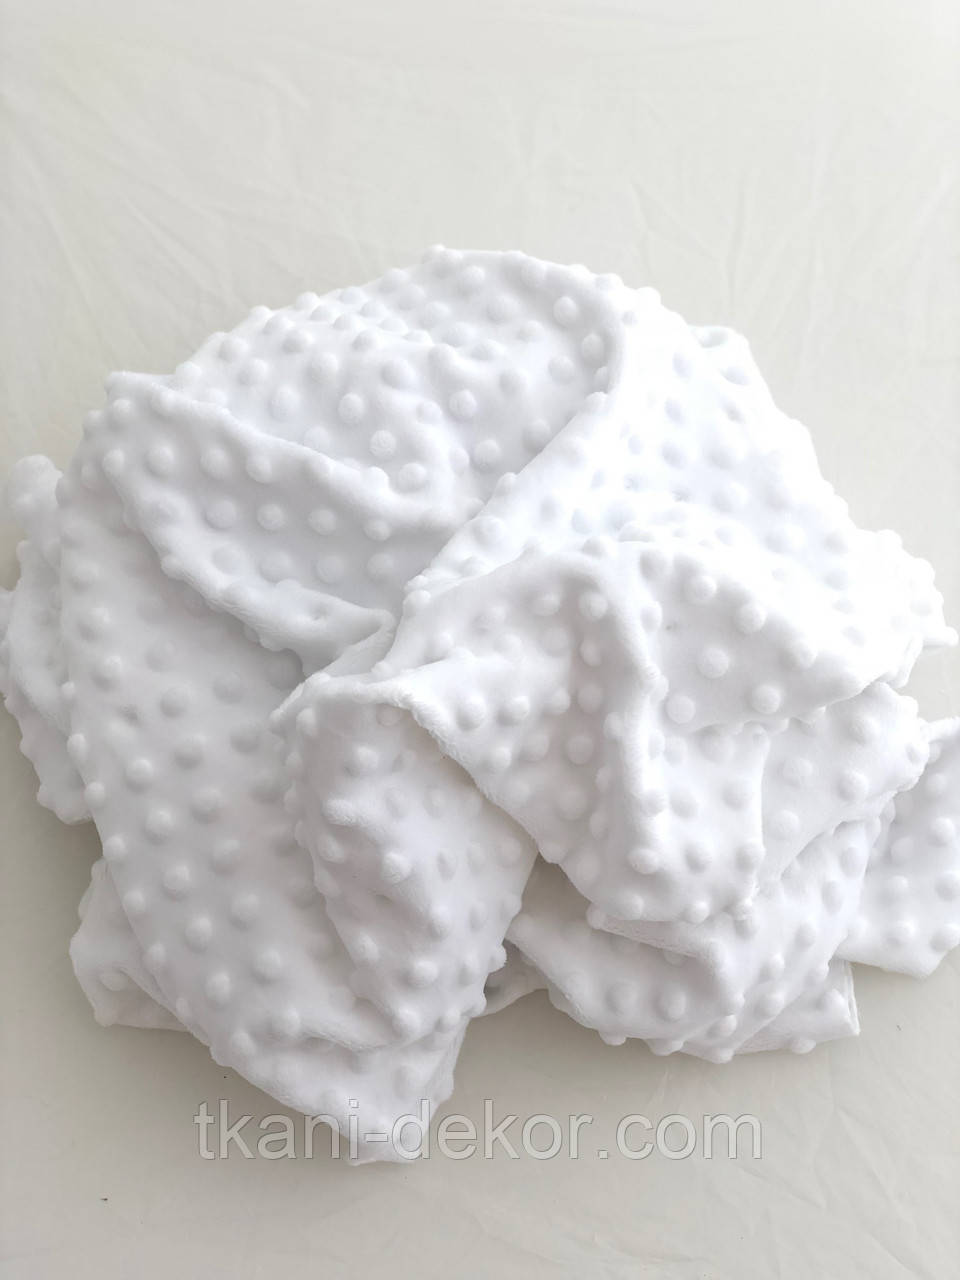 Плюшевая ткань Minky белого цвета  пупырка (невыбеленный)